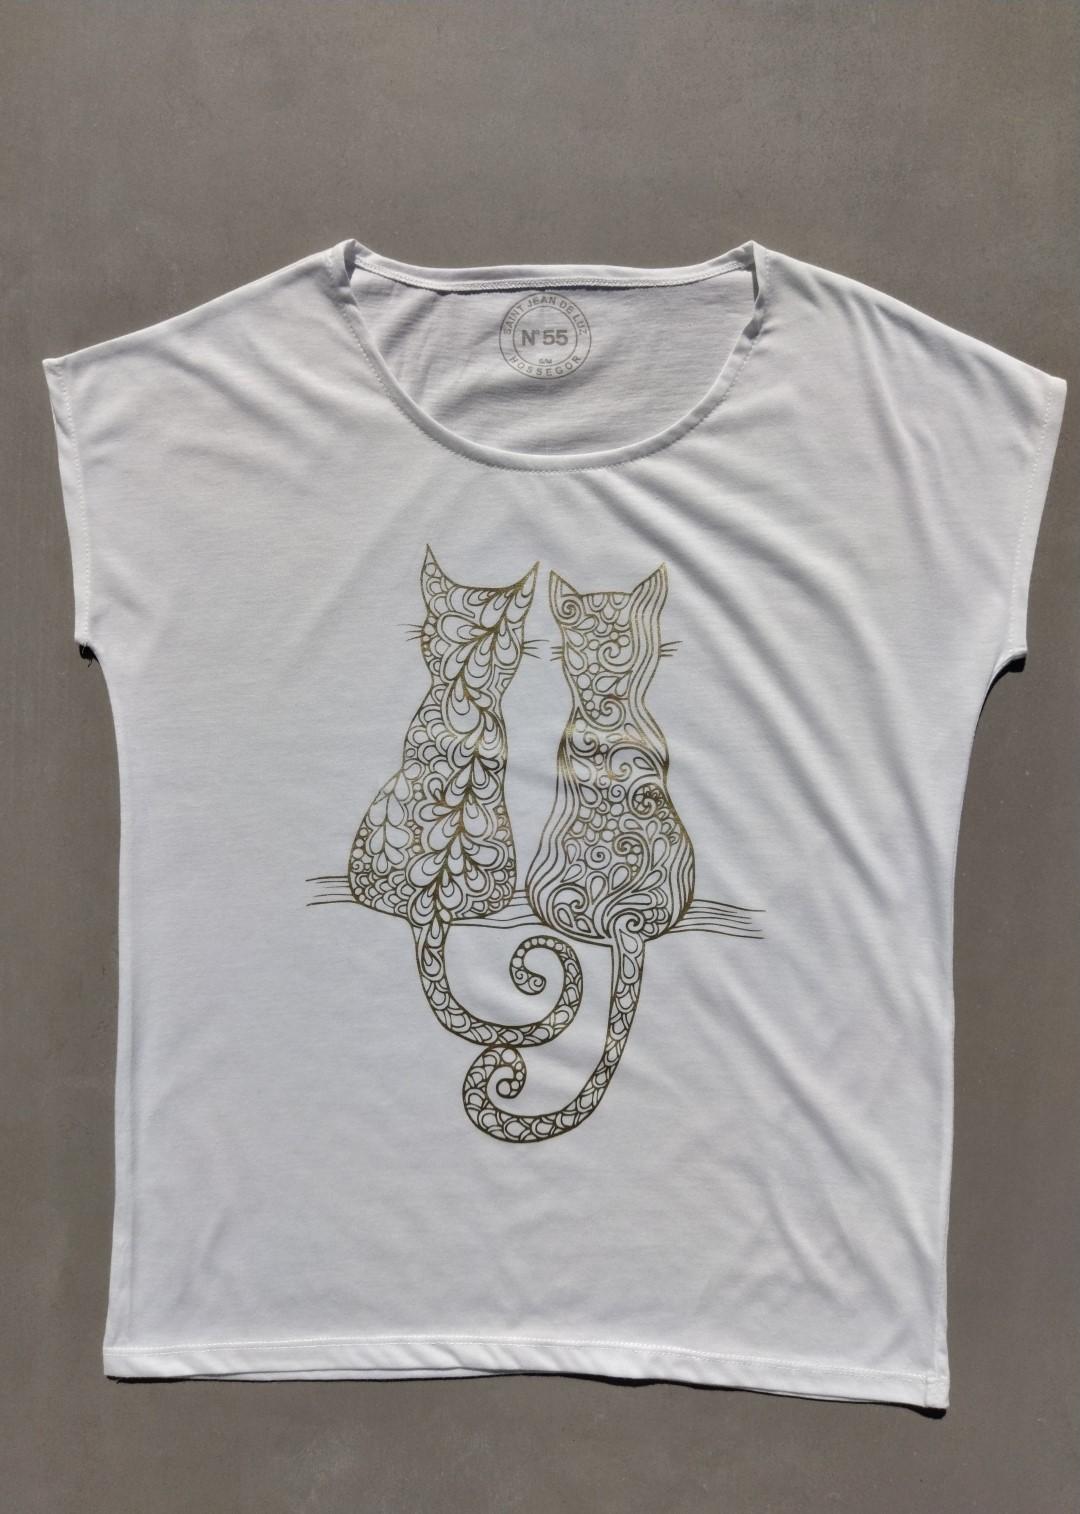 Tee shirt blanc N°55 chats or.